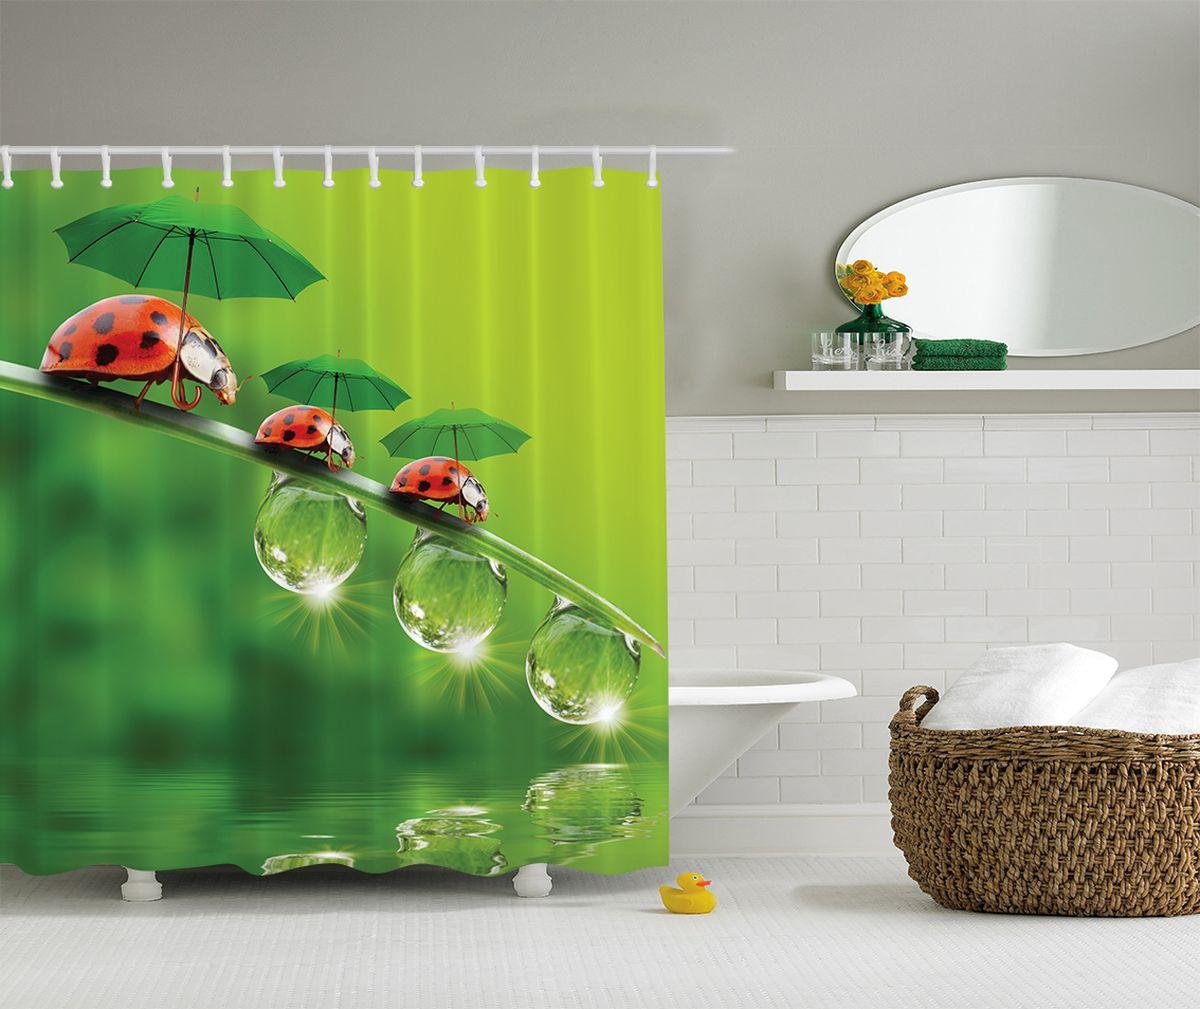 Штора для ванной комнаты Magic Lady Семья и зонты, 180 х 200 см шторы для ванной magic lady штора для ванно 180 200 см